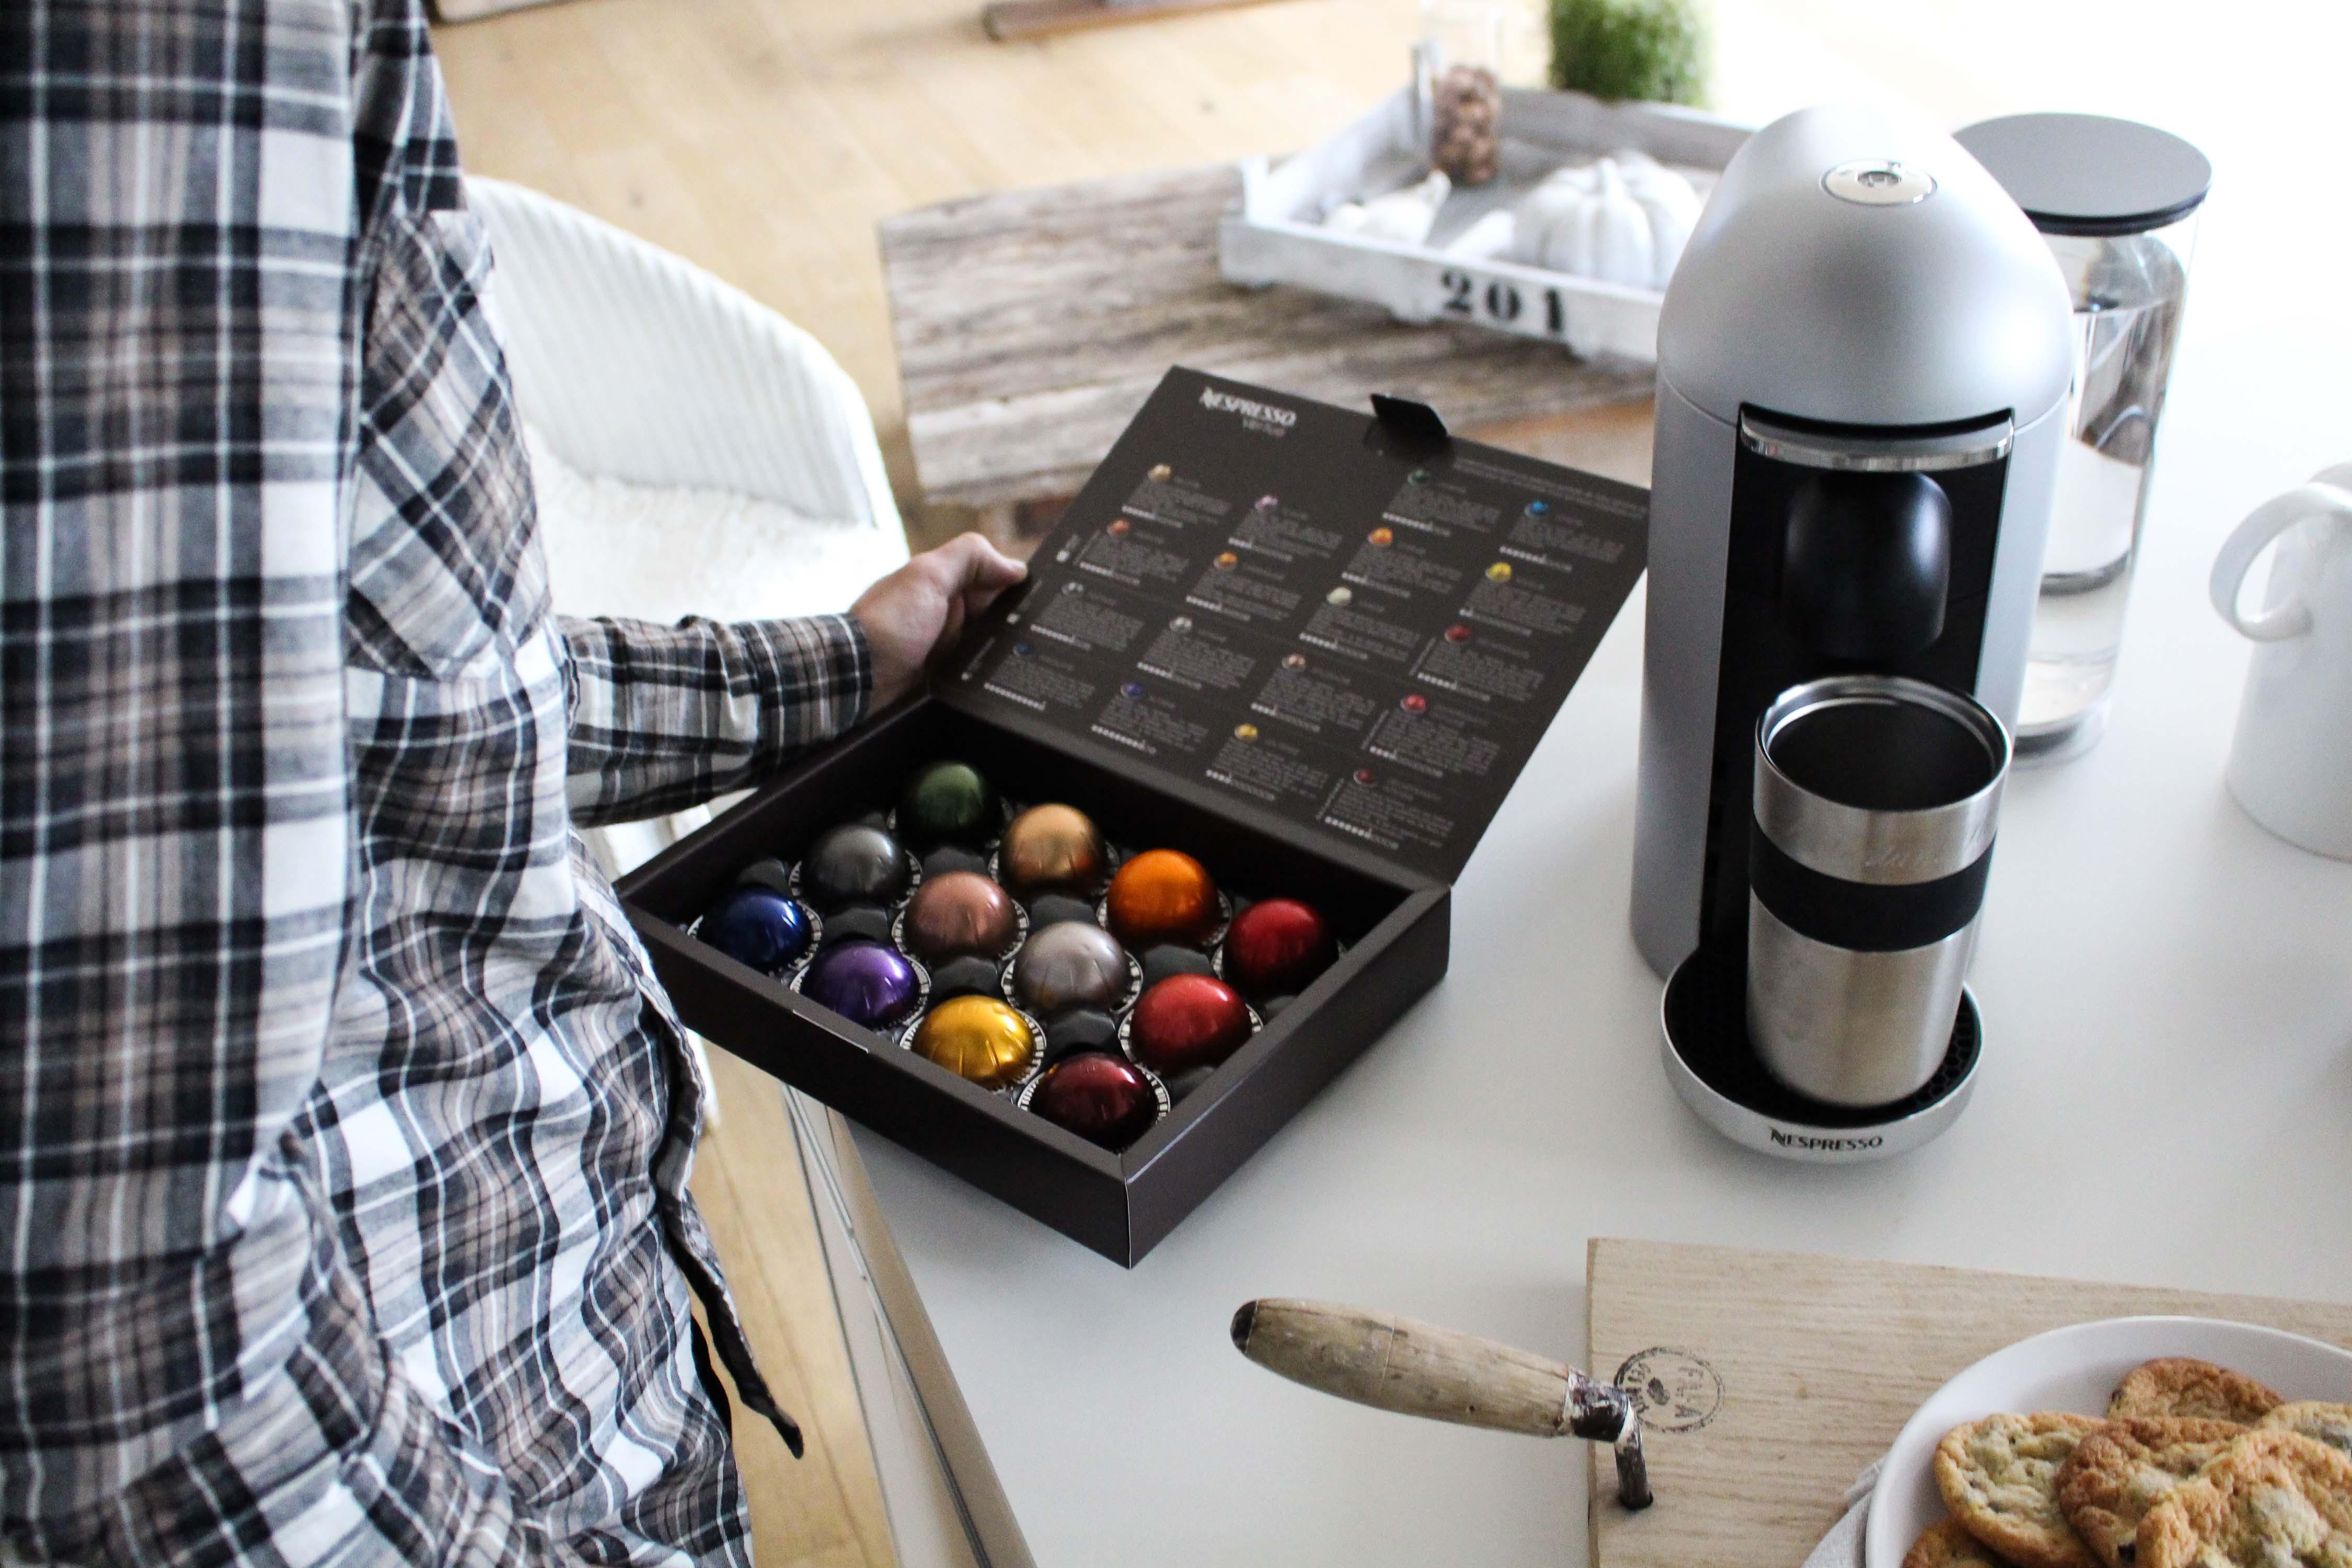 nespresso-recette-linstantflo-11-sur-16